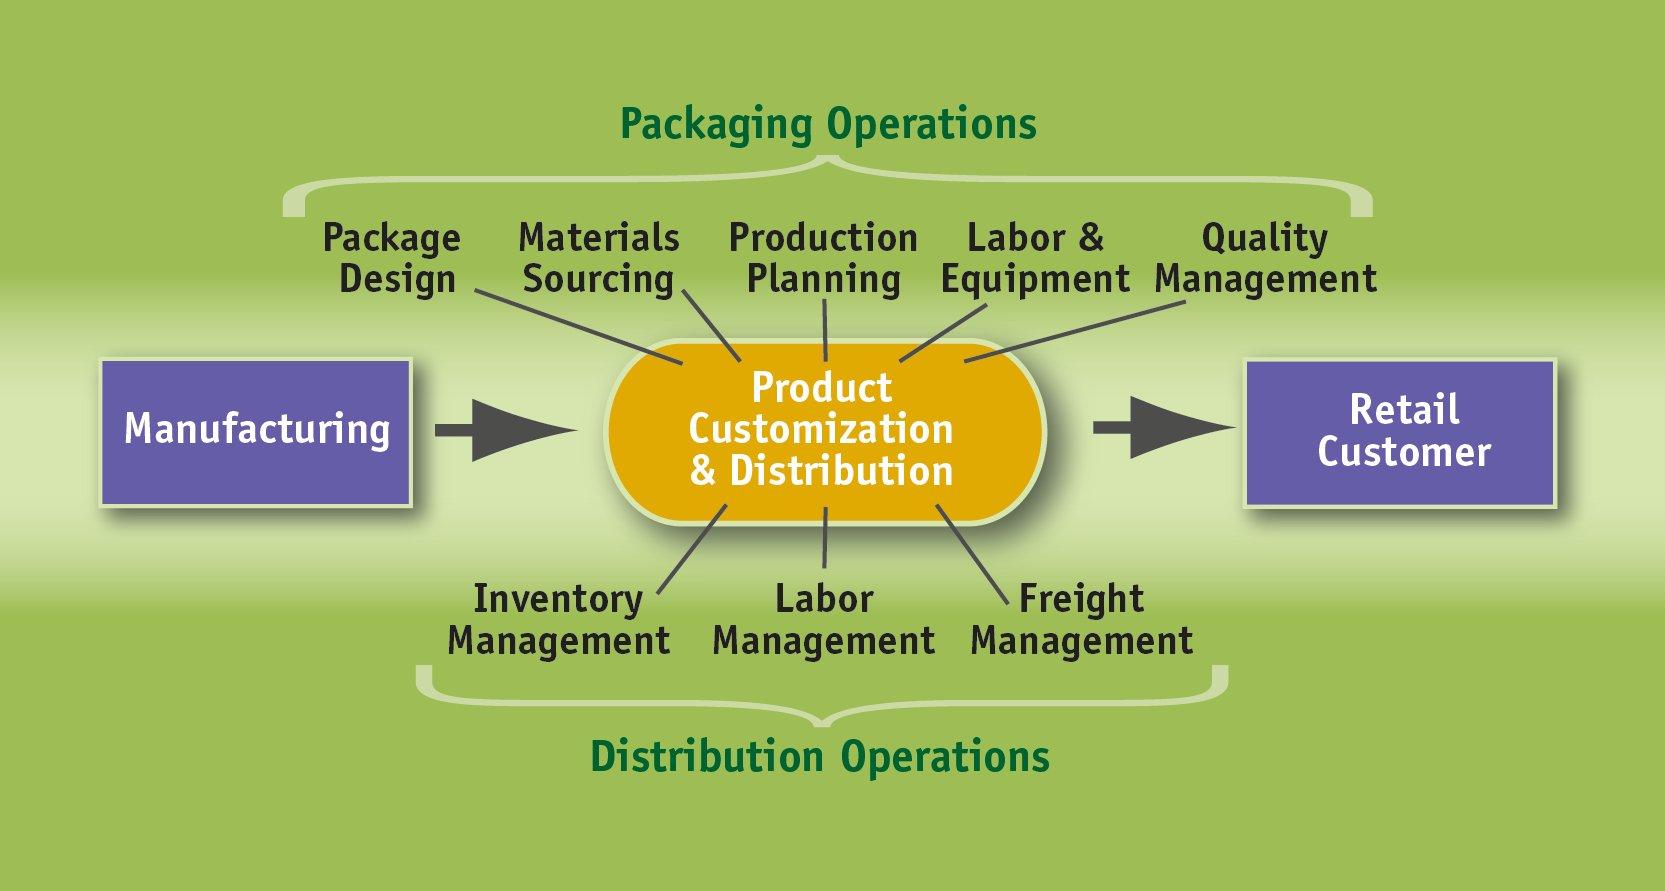 diagram-integrated-packaging-and-distribution-jpg-1.jpg